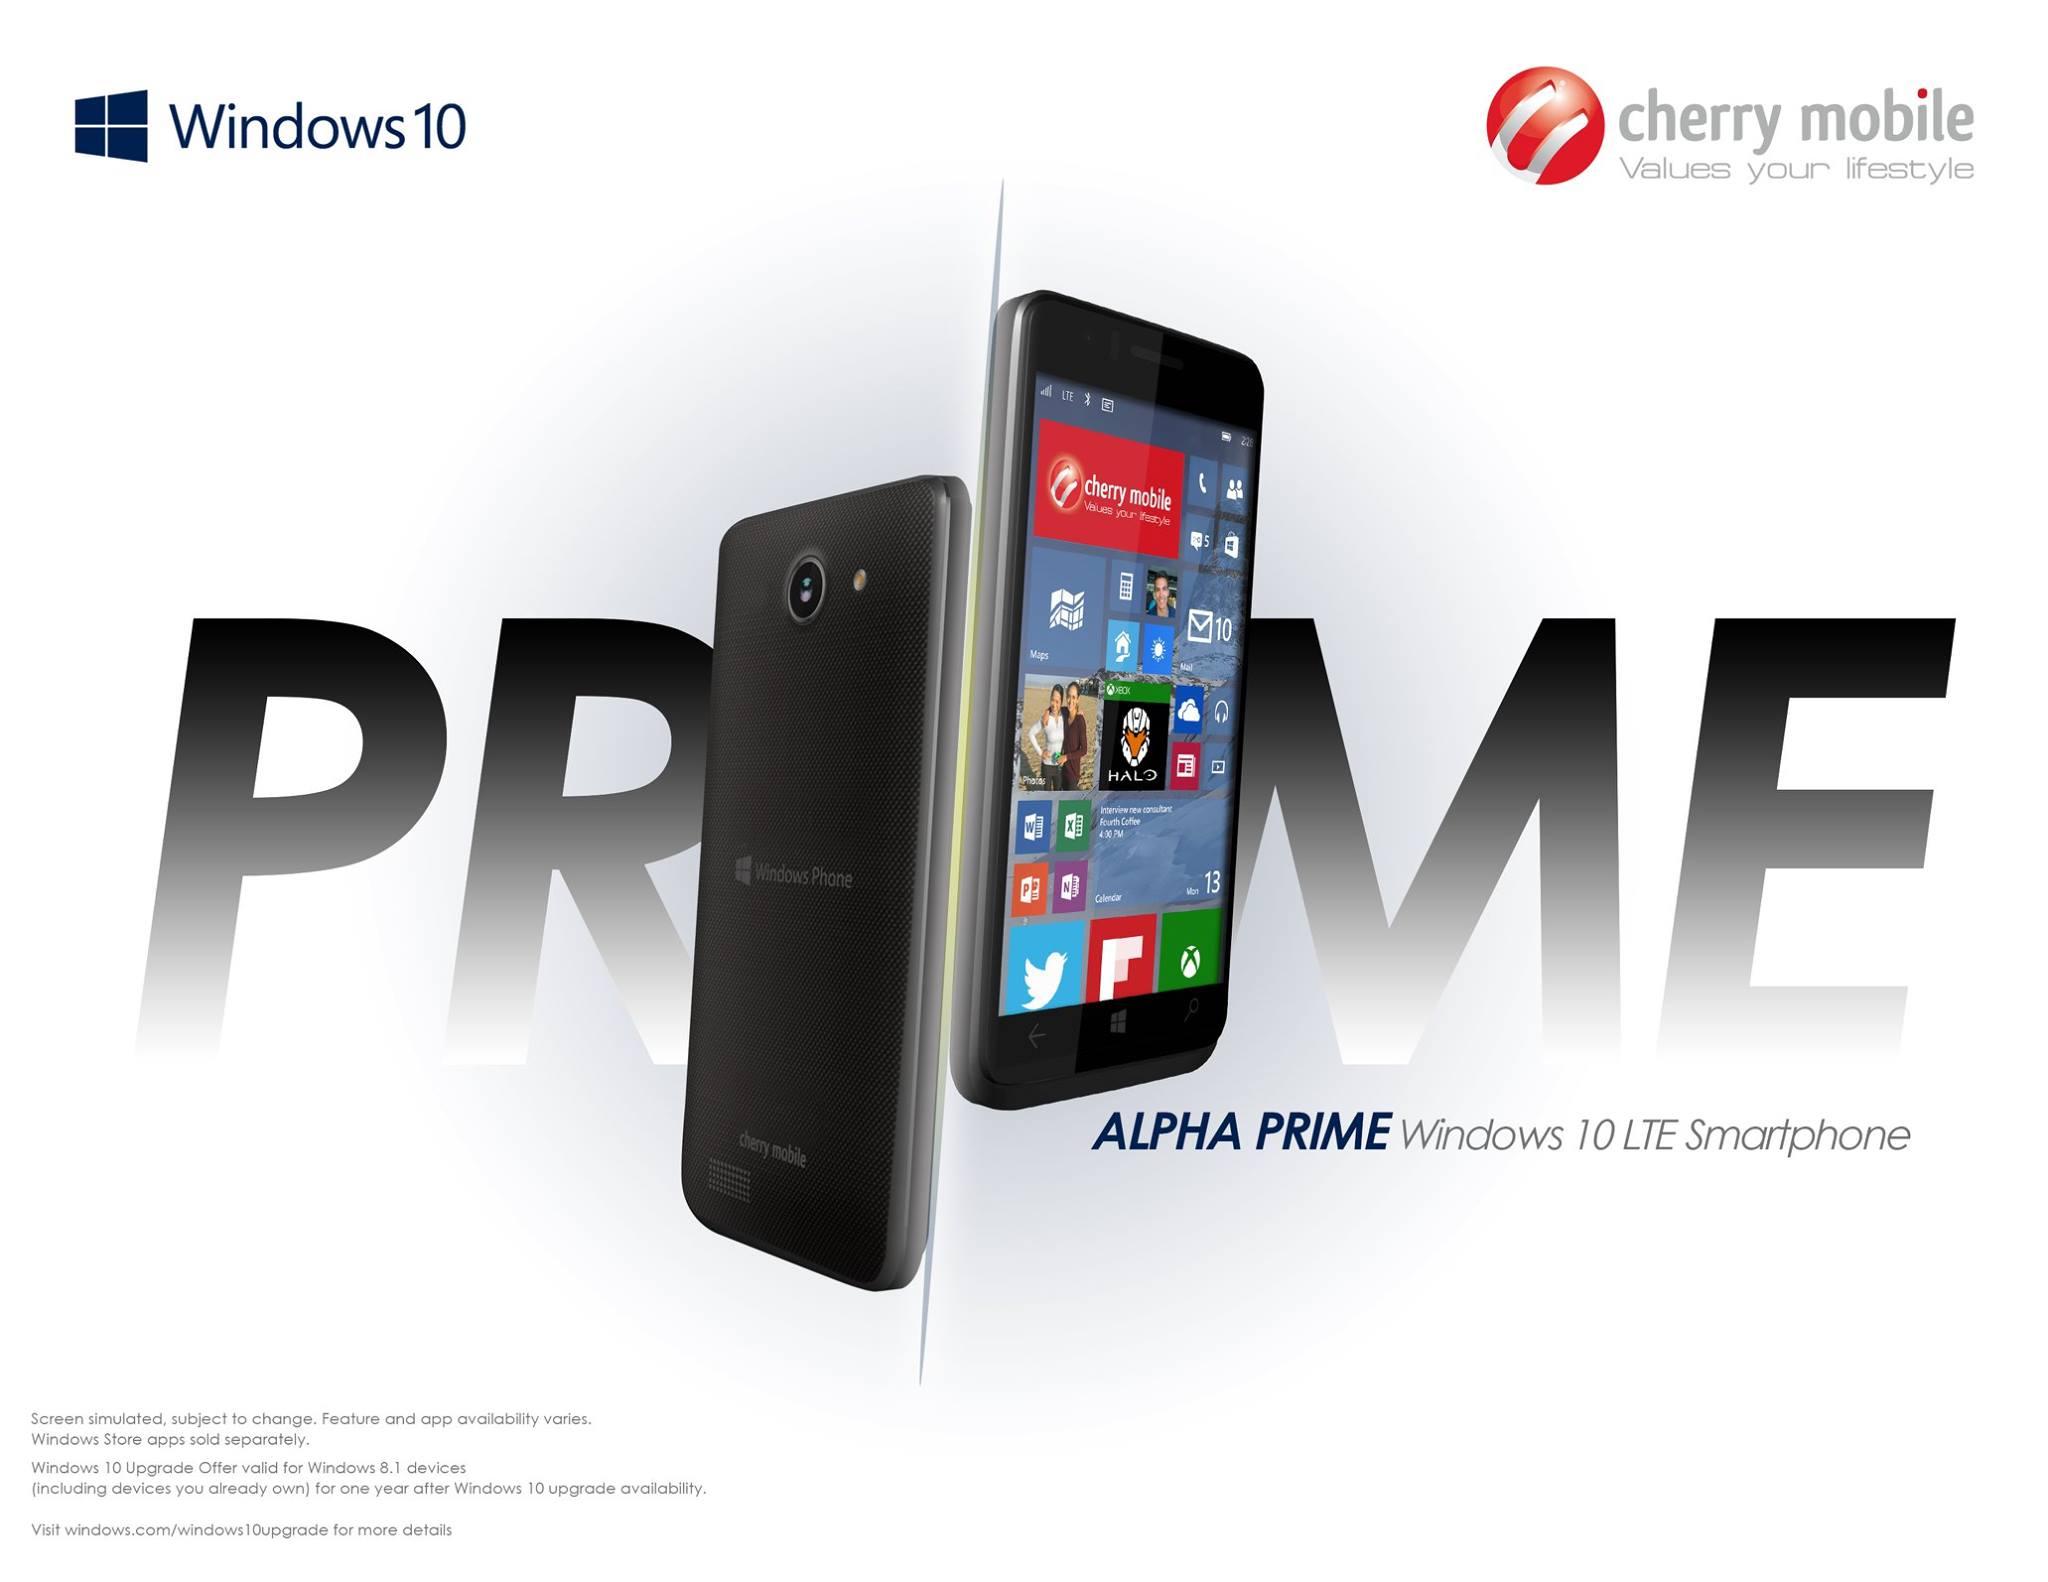 alpha prime con windows 10